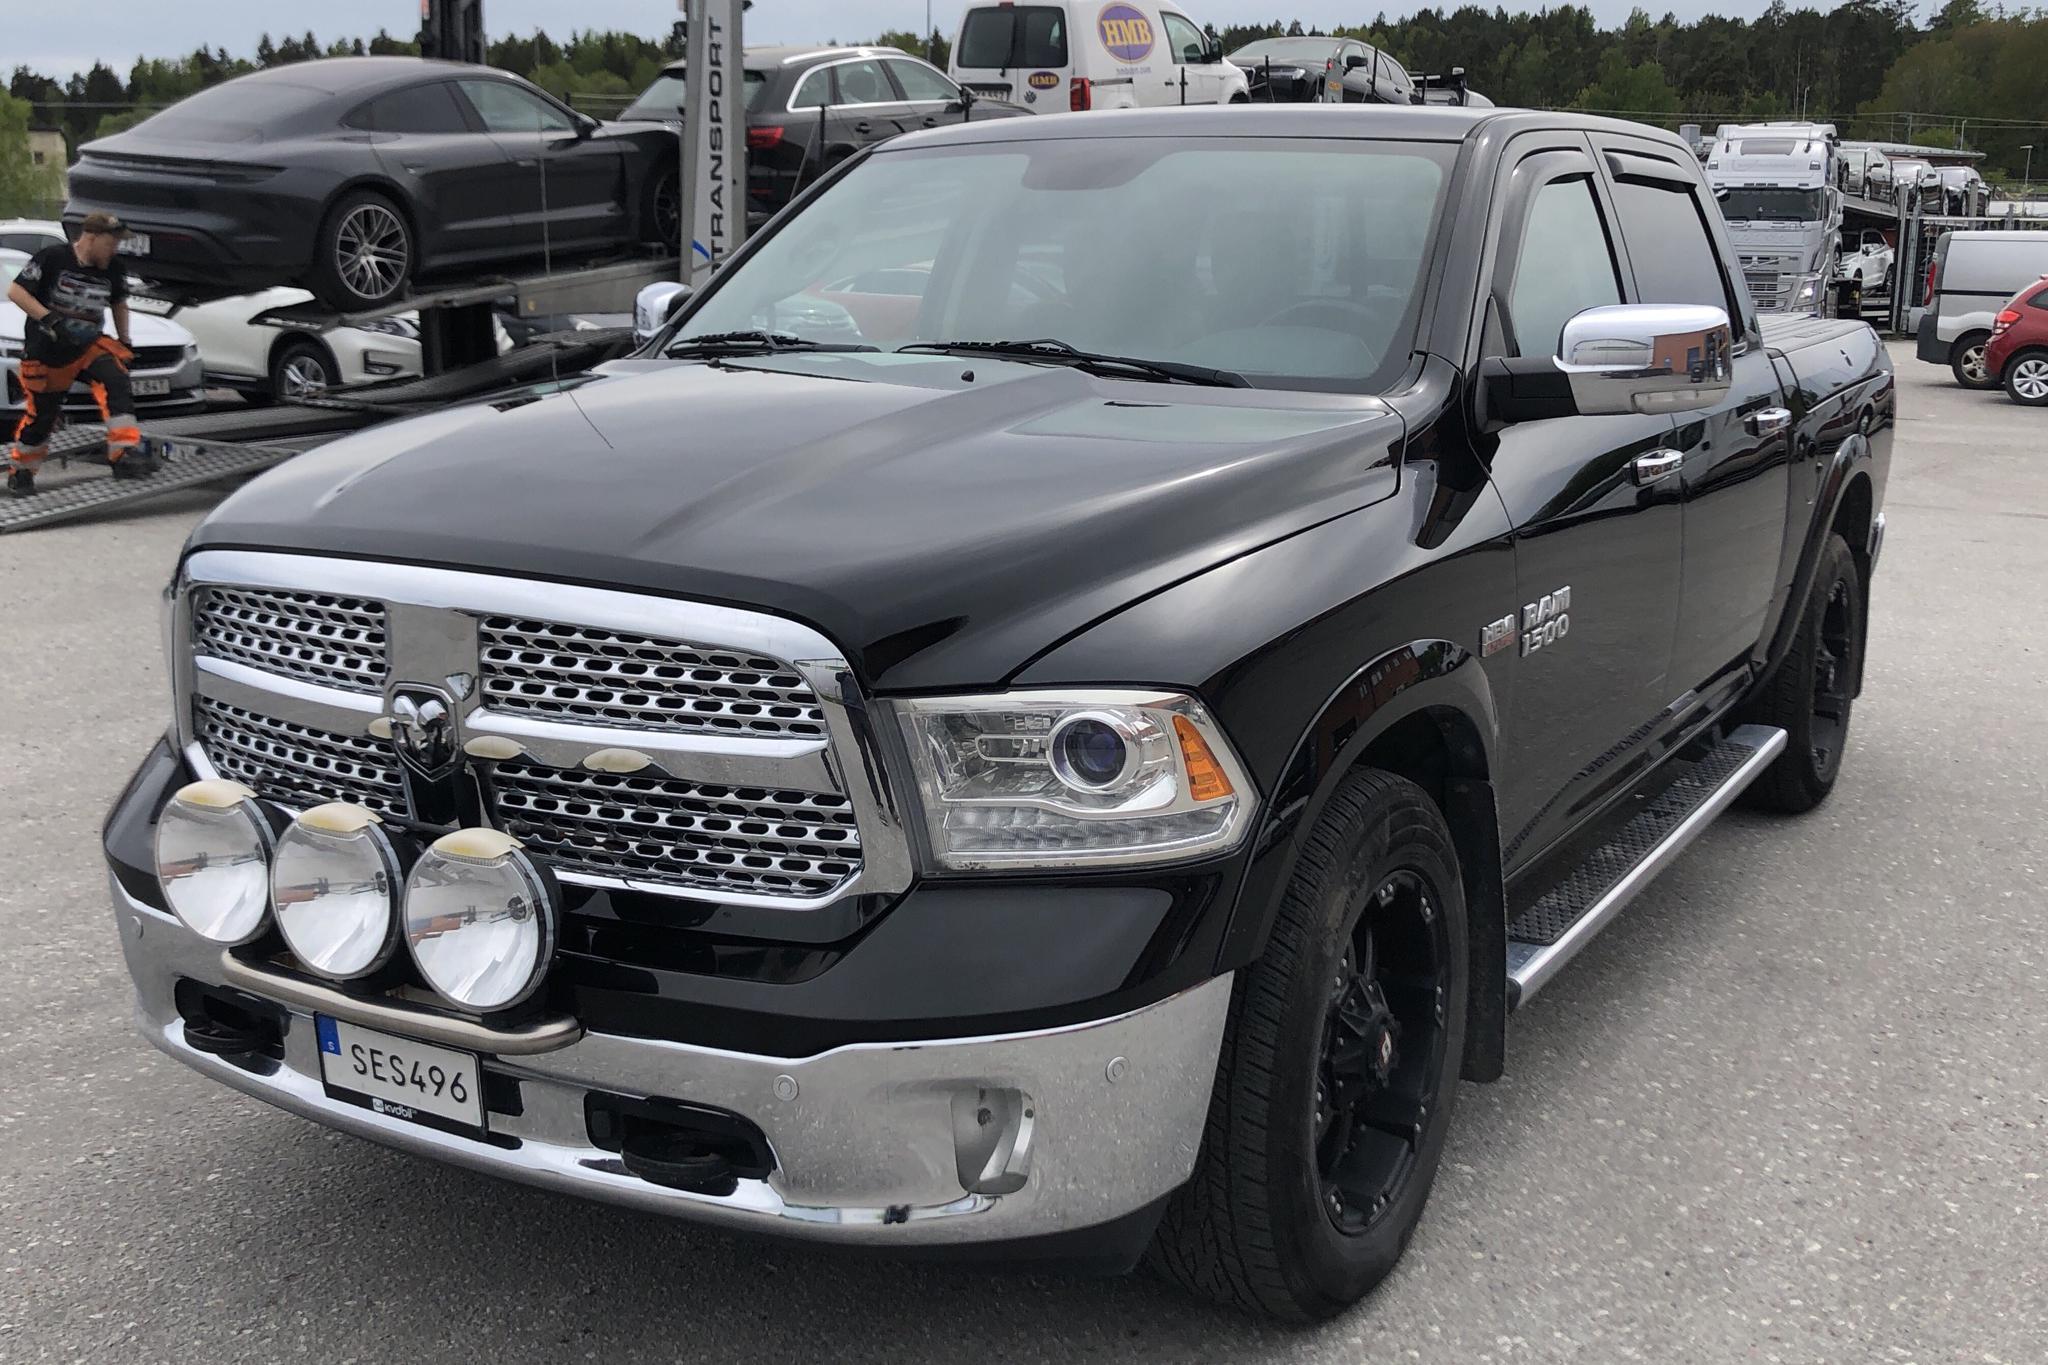 Dodge RAM 1500 5.7 4WD (401hk) - 168 480 km - Automatic - black - 2014